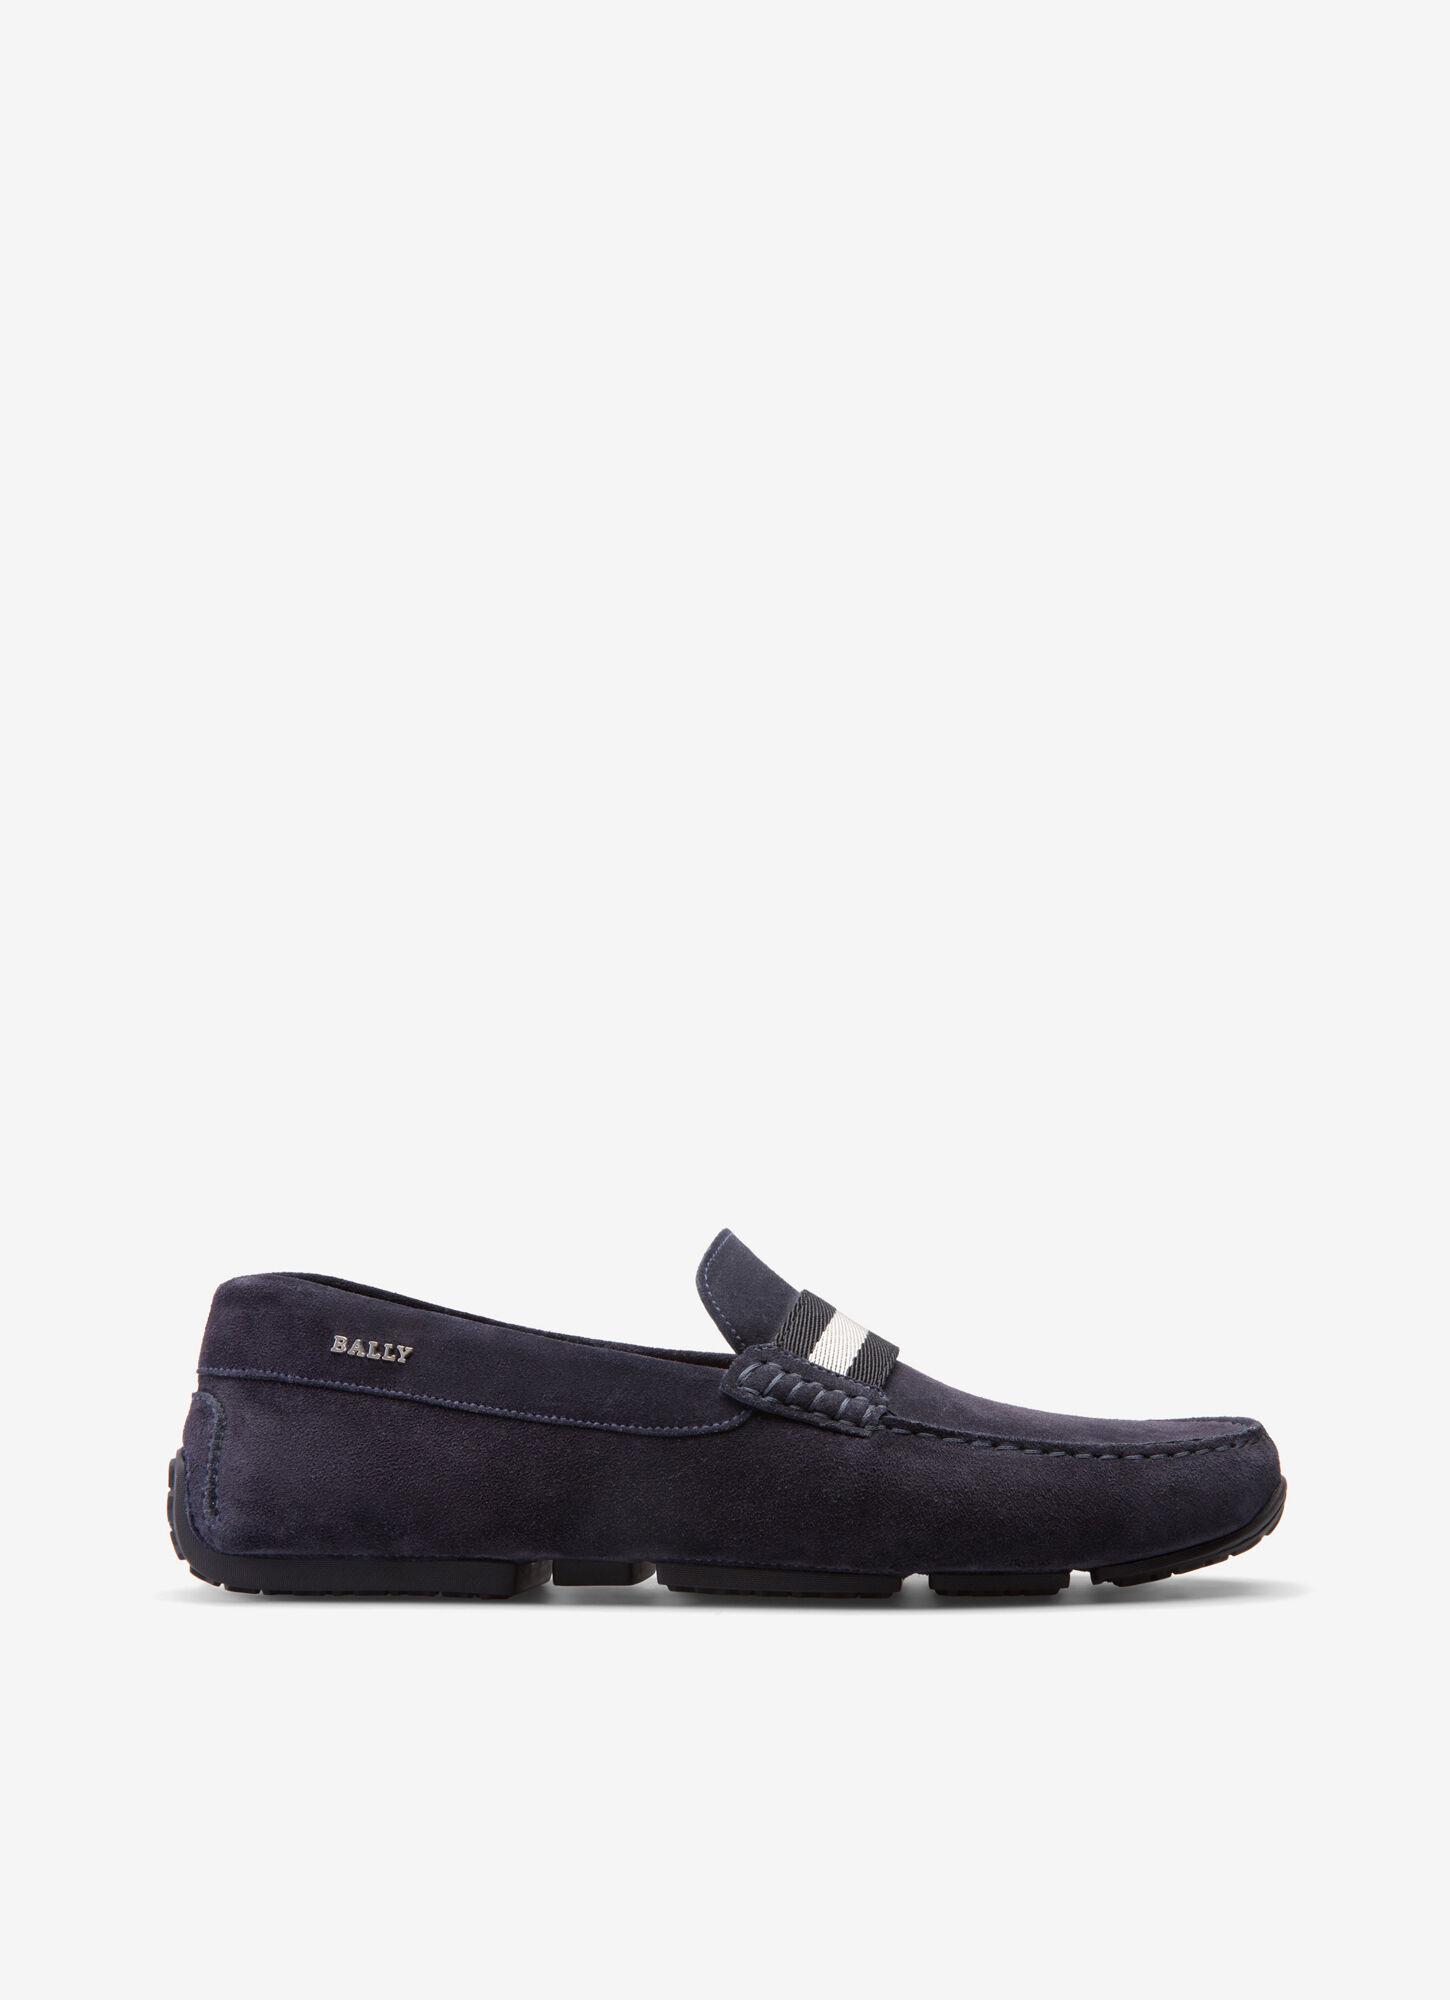 PEARCE | Men's Drivers | Bally Shoes